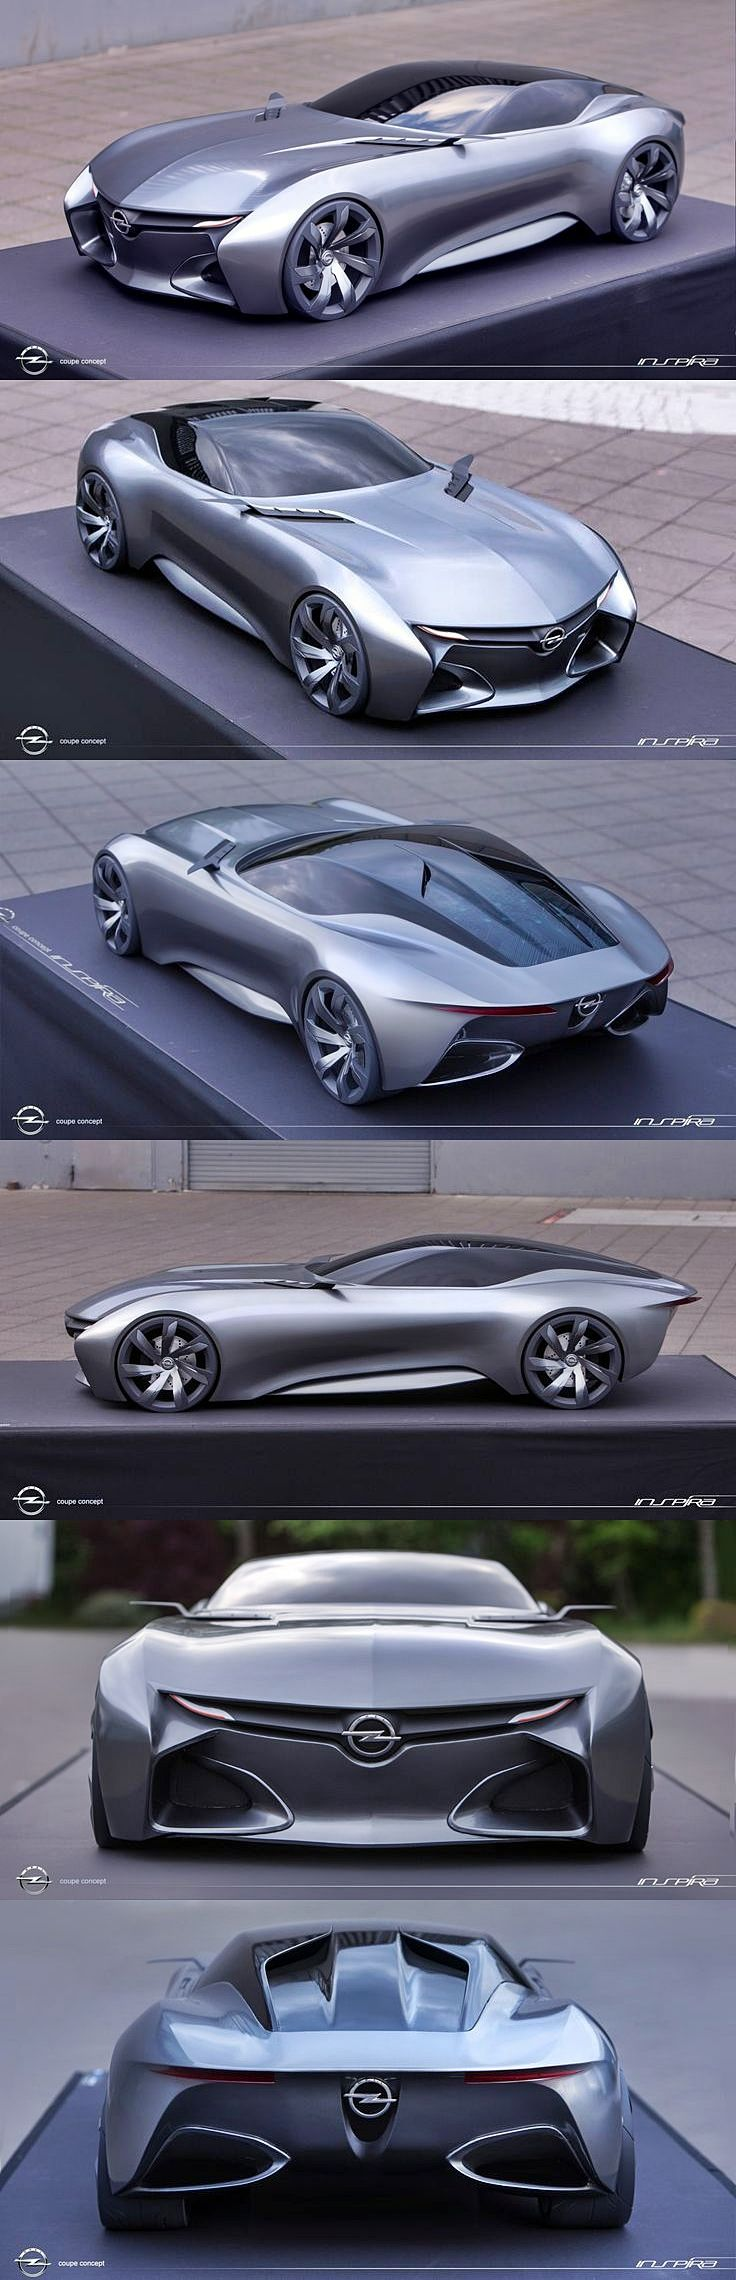 Opel Inspira https://www.amazon.co.uk/Baby-Car-Mirror-Shatterproof-Installation/dp/B06XHG6SSY/ref=sr_1_2?ie=UTF8&qid=1499074433&sr=8-2&keywords=Kingseye